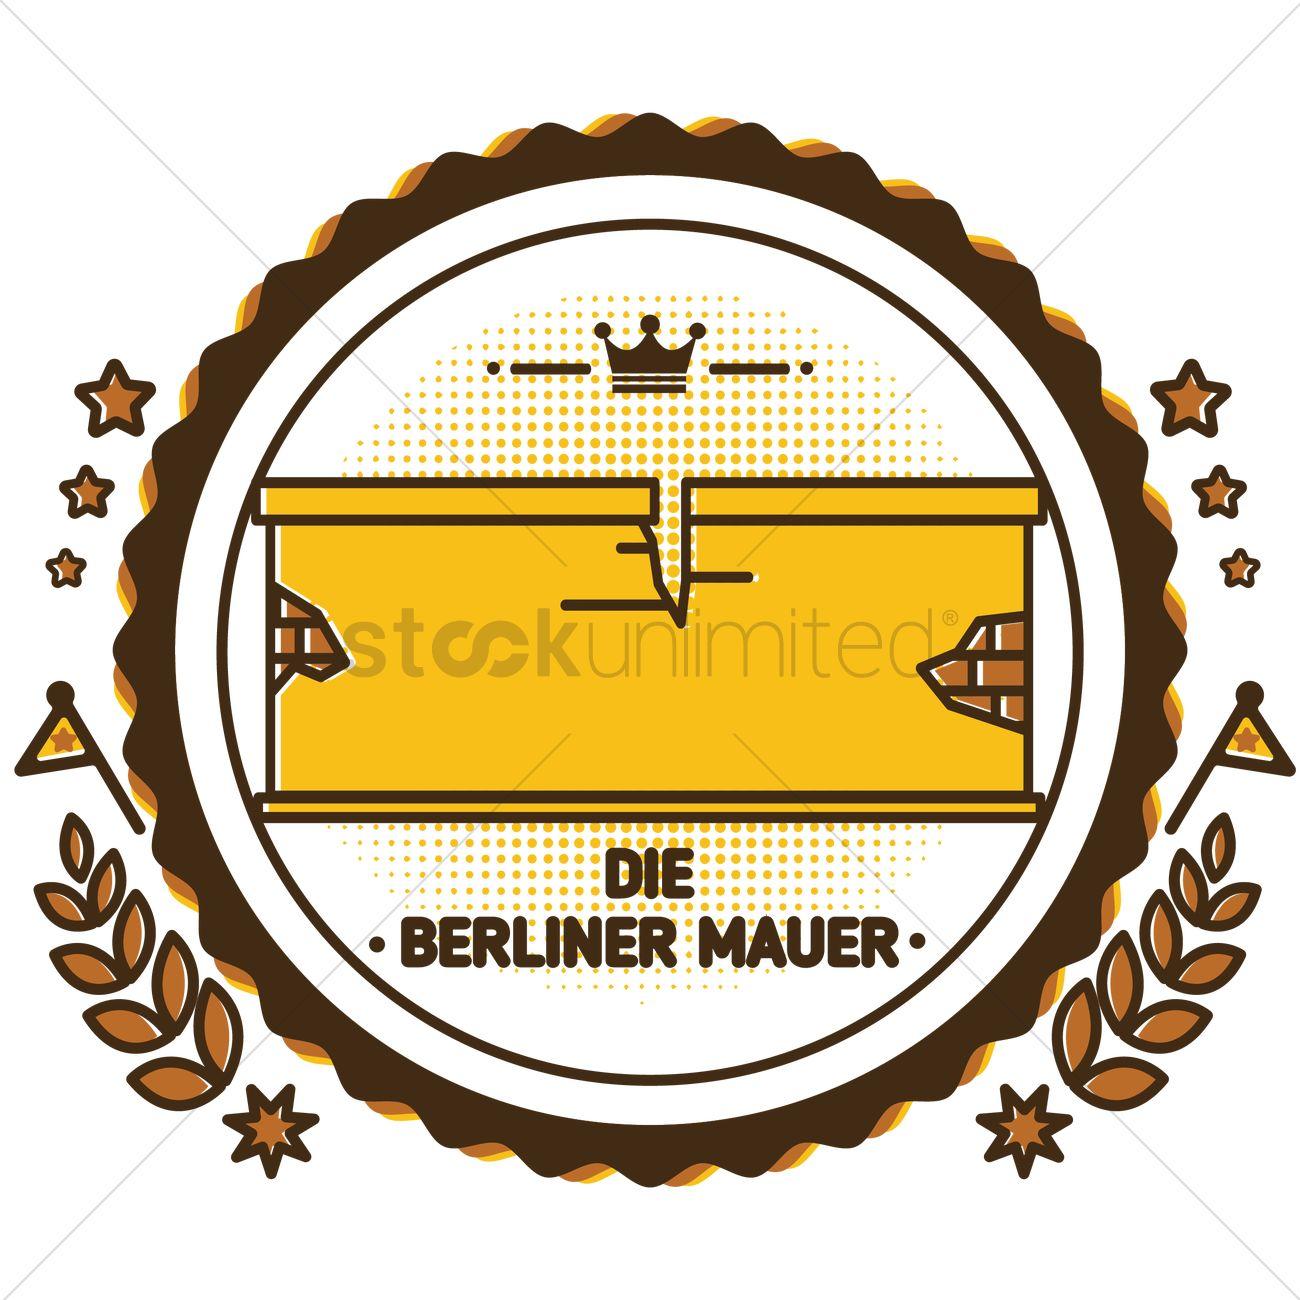 Die berliner mauer Vector Image.